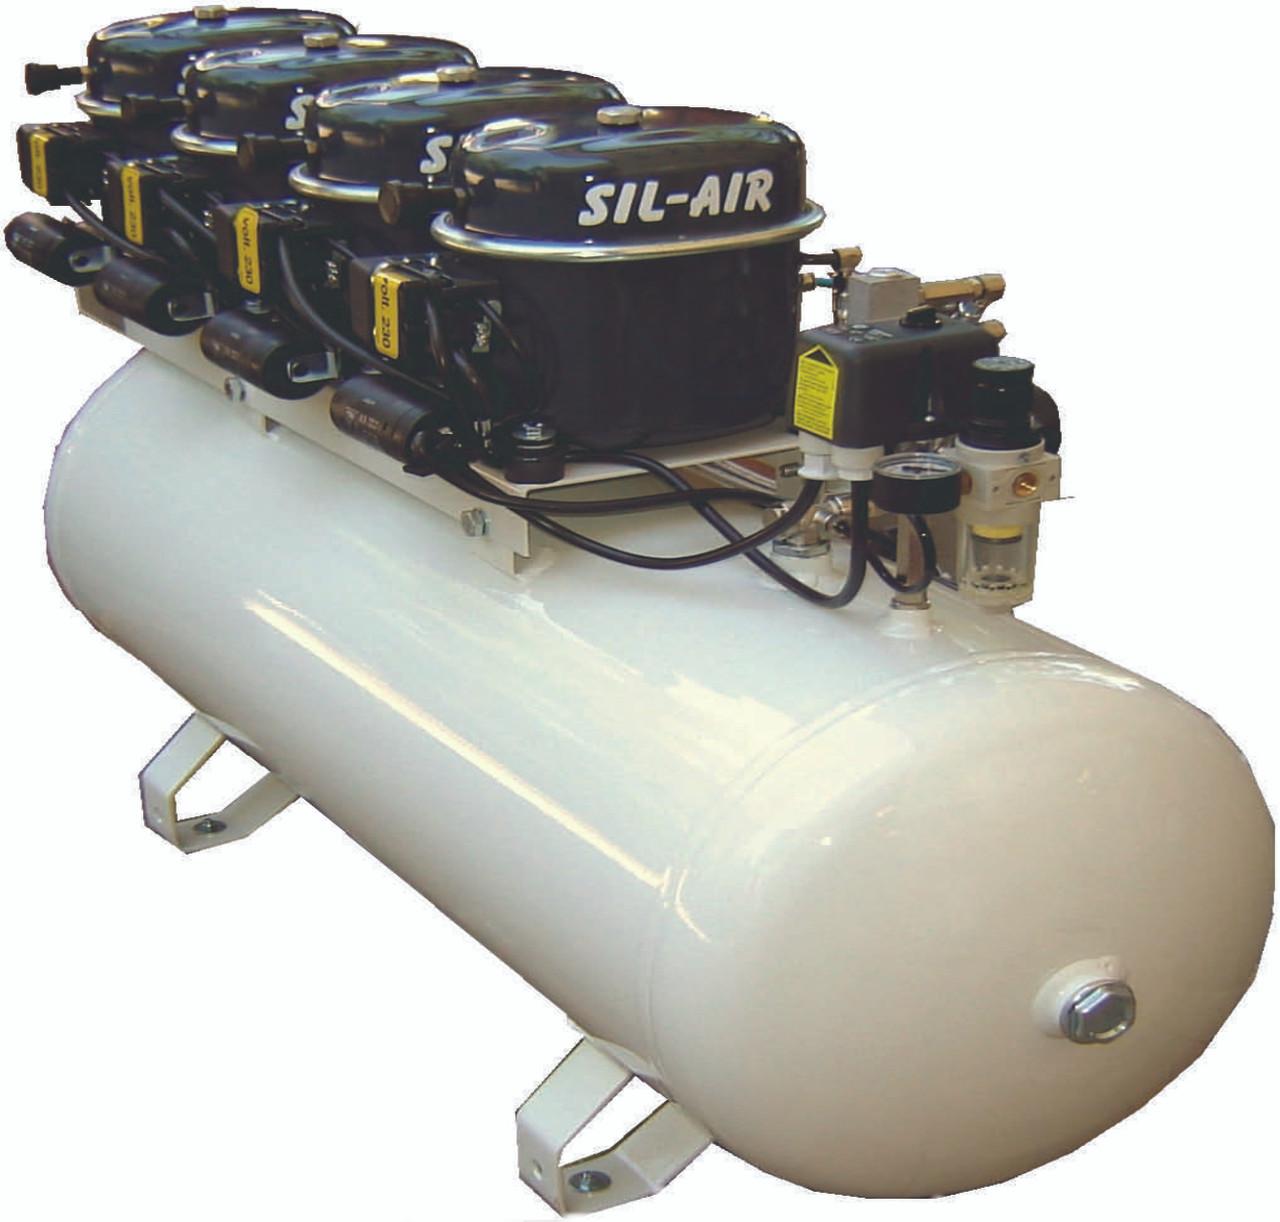 Sil-Air 200-100 4 x 1/2 HP 230 Volt Single Phase 26 Gallon Silent Air Compressor by Silentaire Technologies